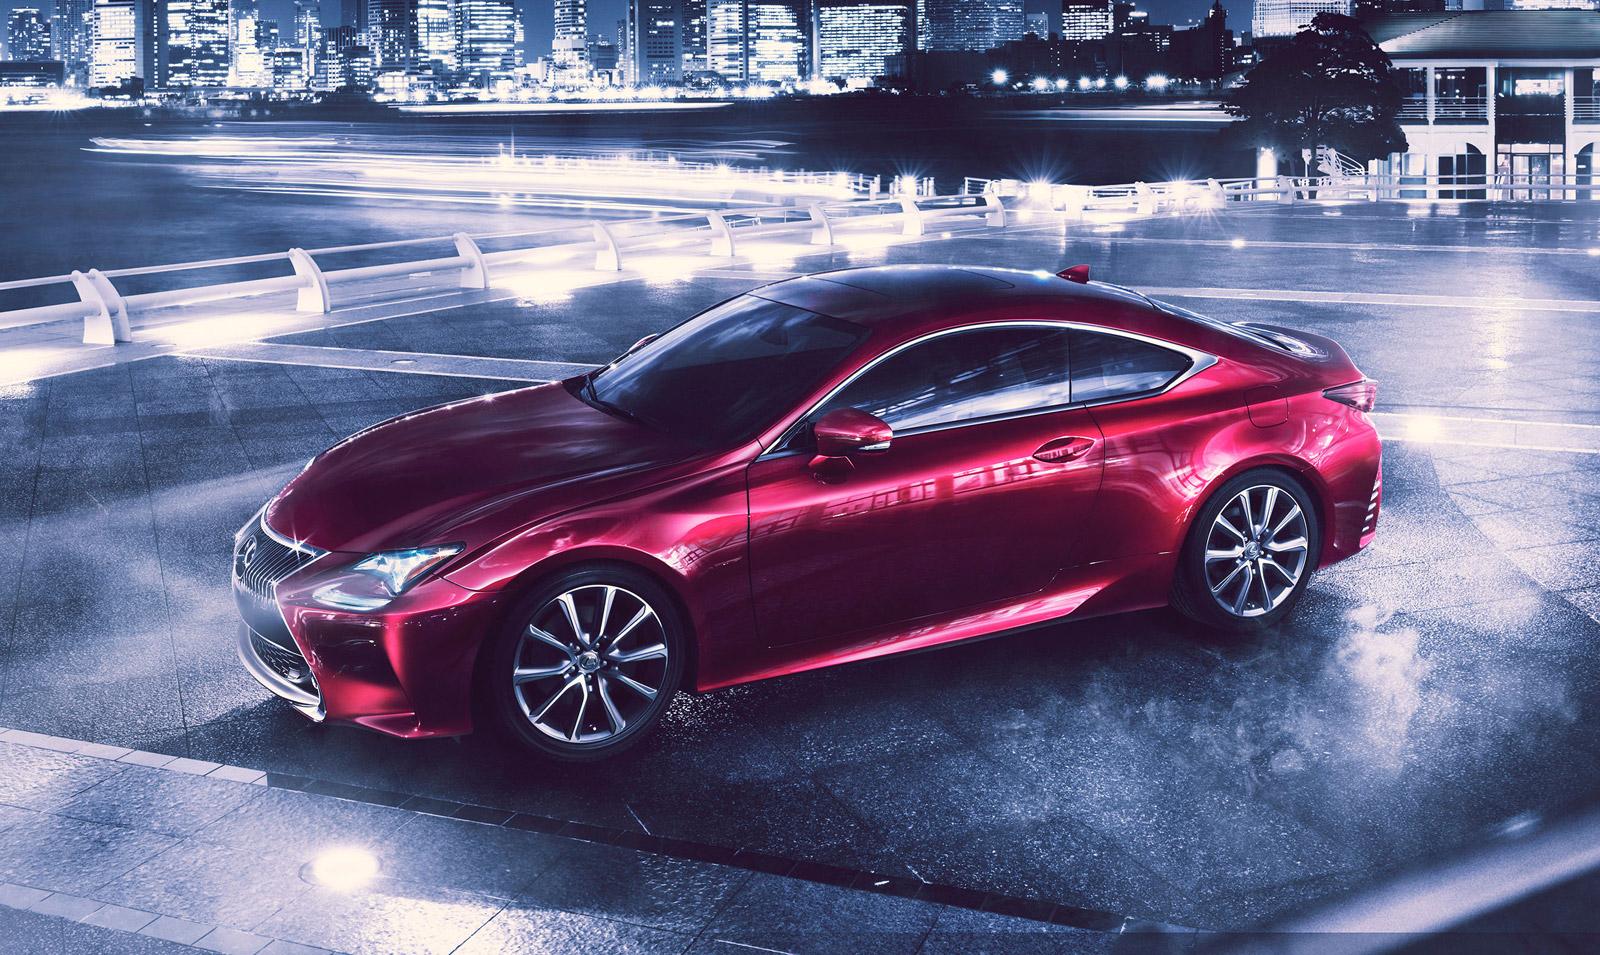 lexus rc 300h hybrid coupe to debut at tokyo motor show. Black Bedroom Furniture Sets. Home Design Ideas